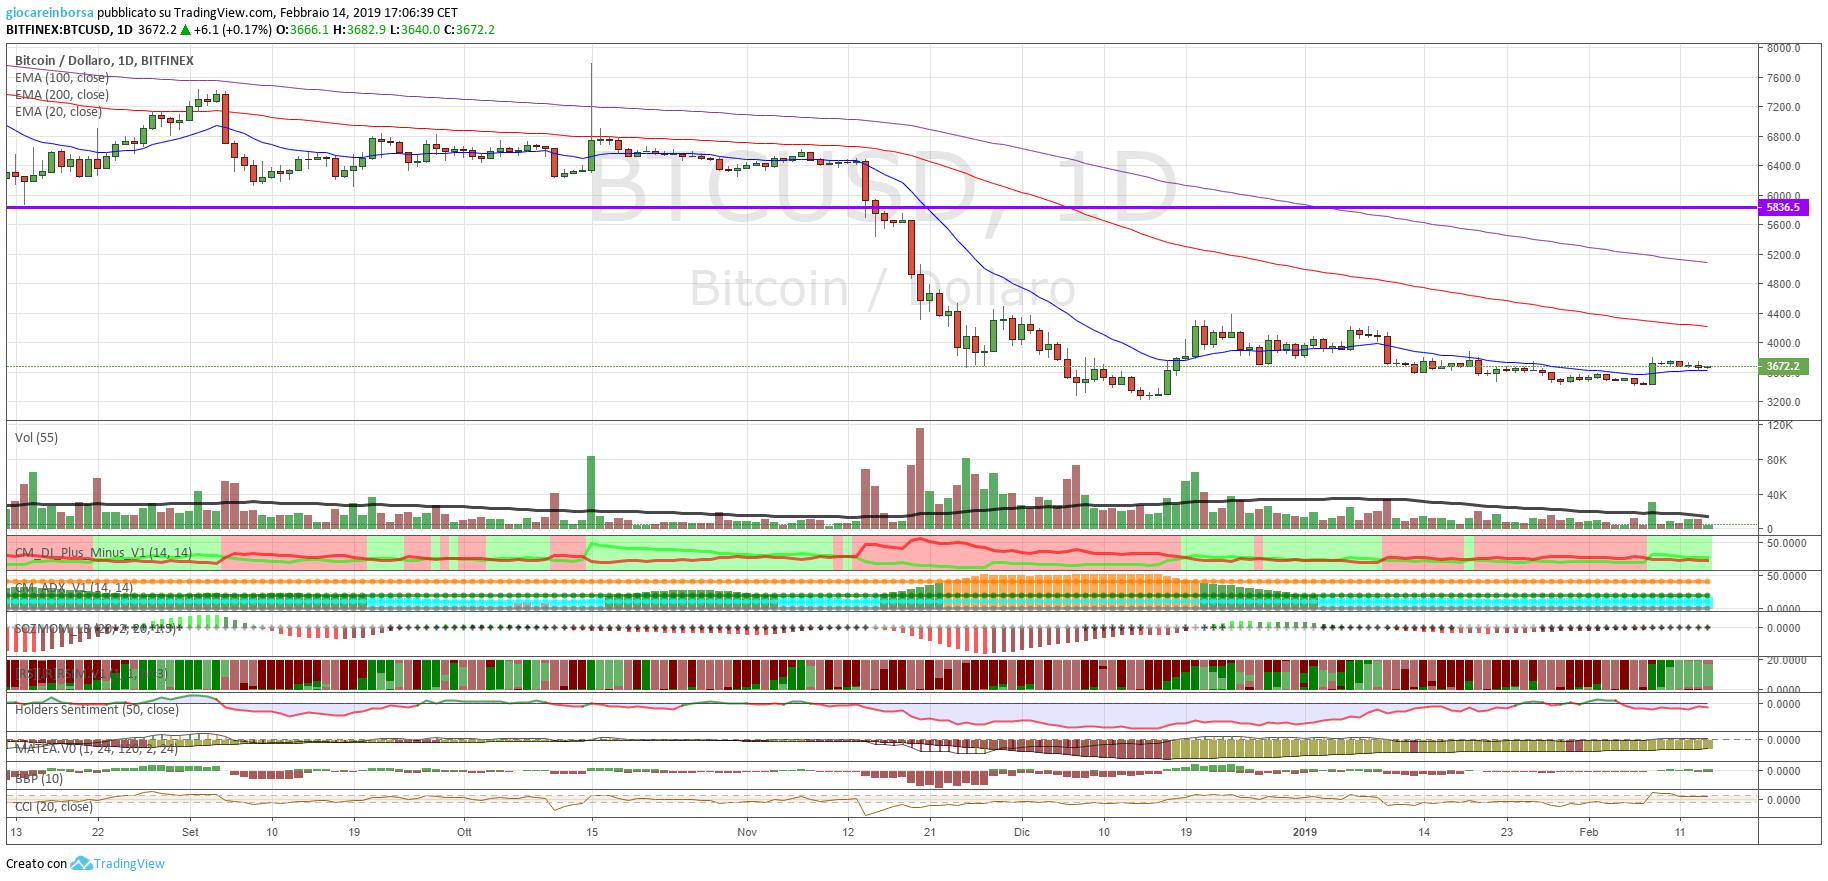 Cambio Bitcoin Dollaro, analisi al 21 febbraio 2019